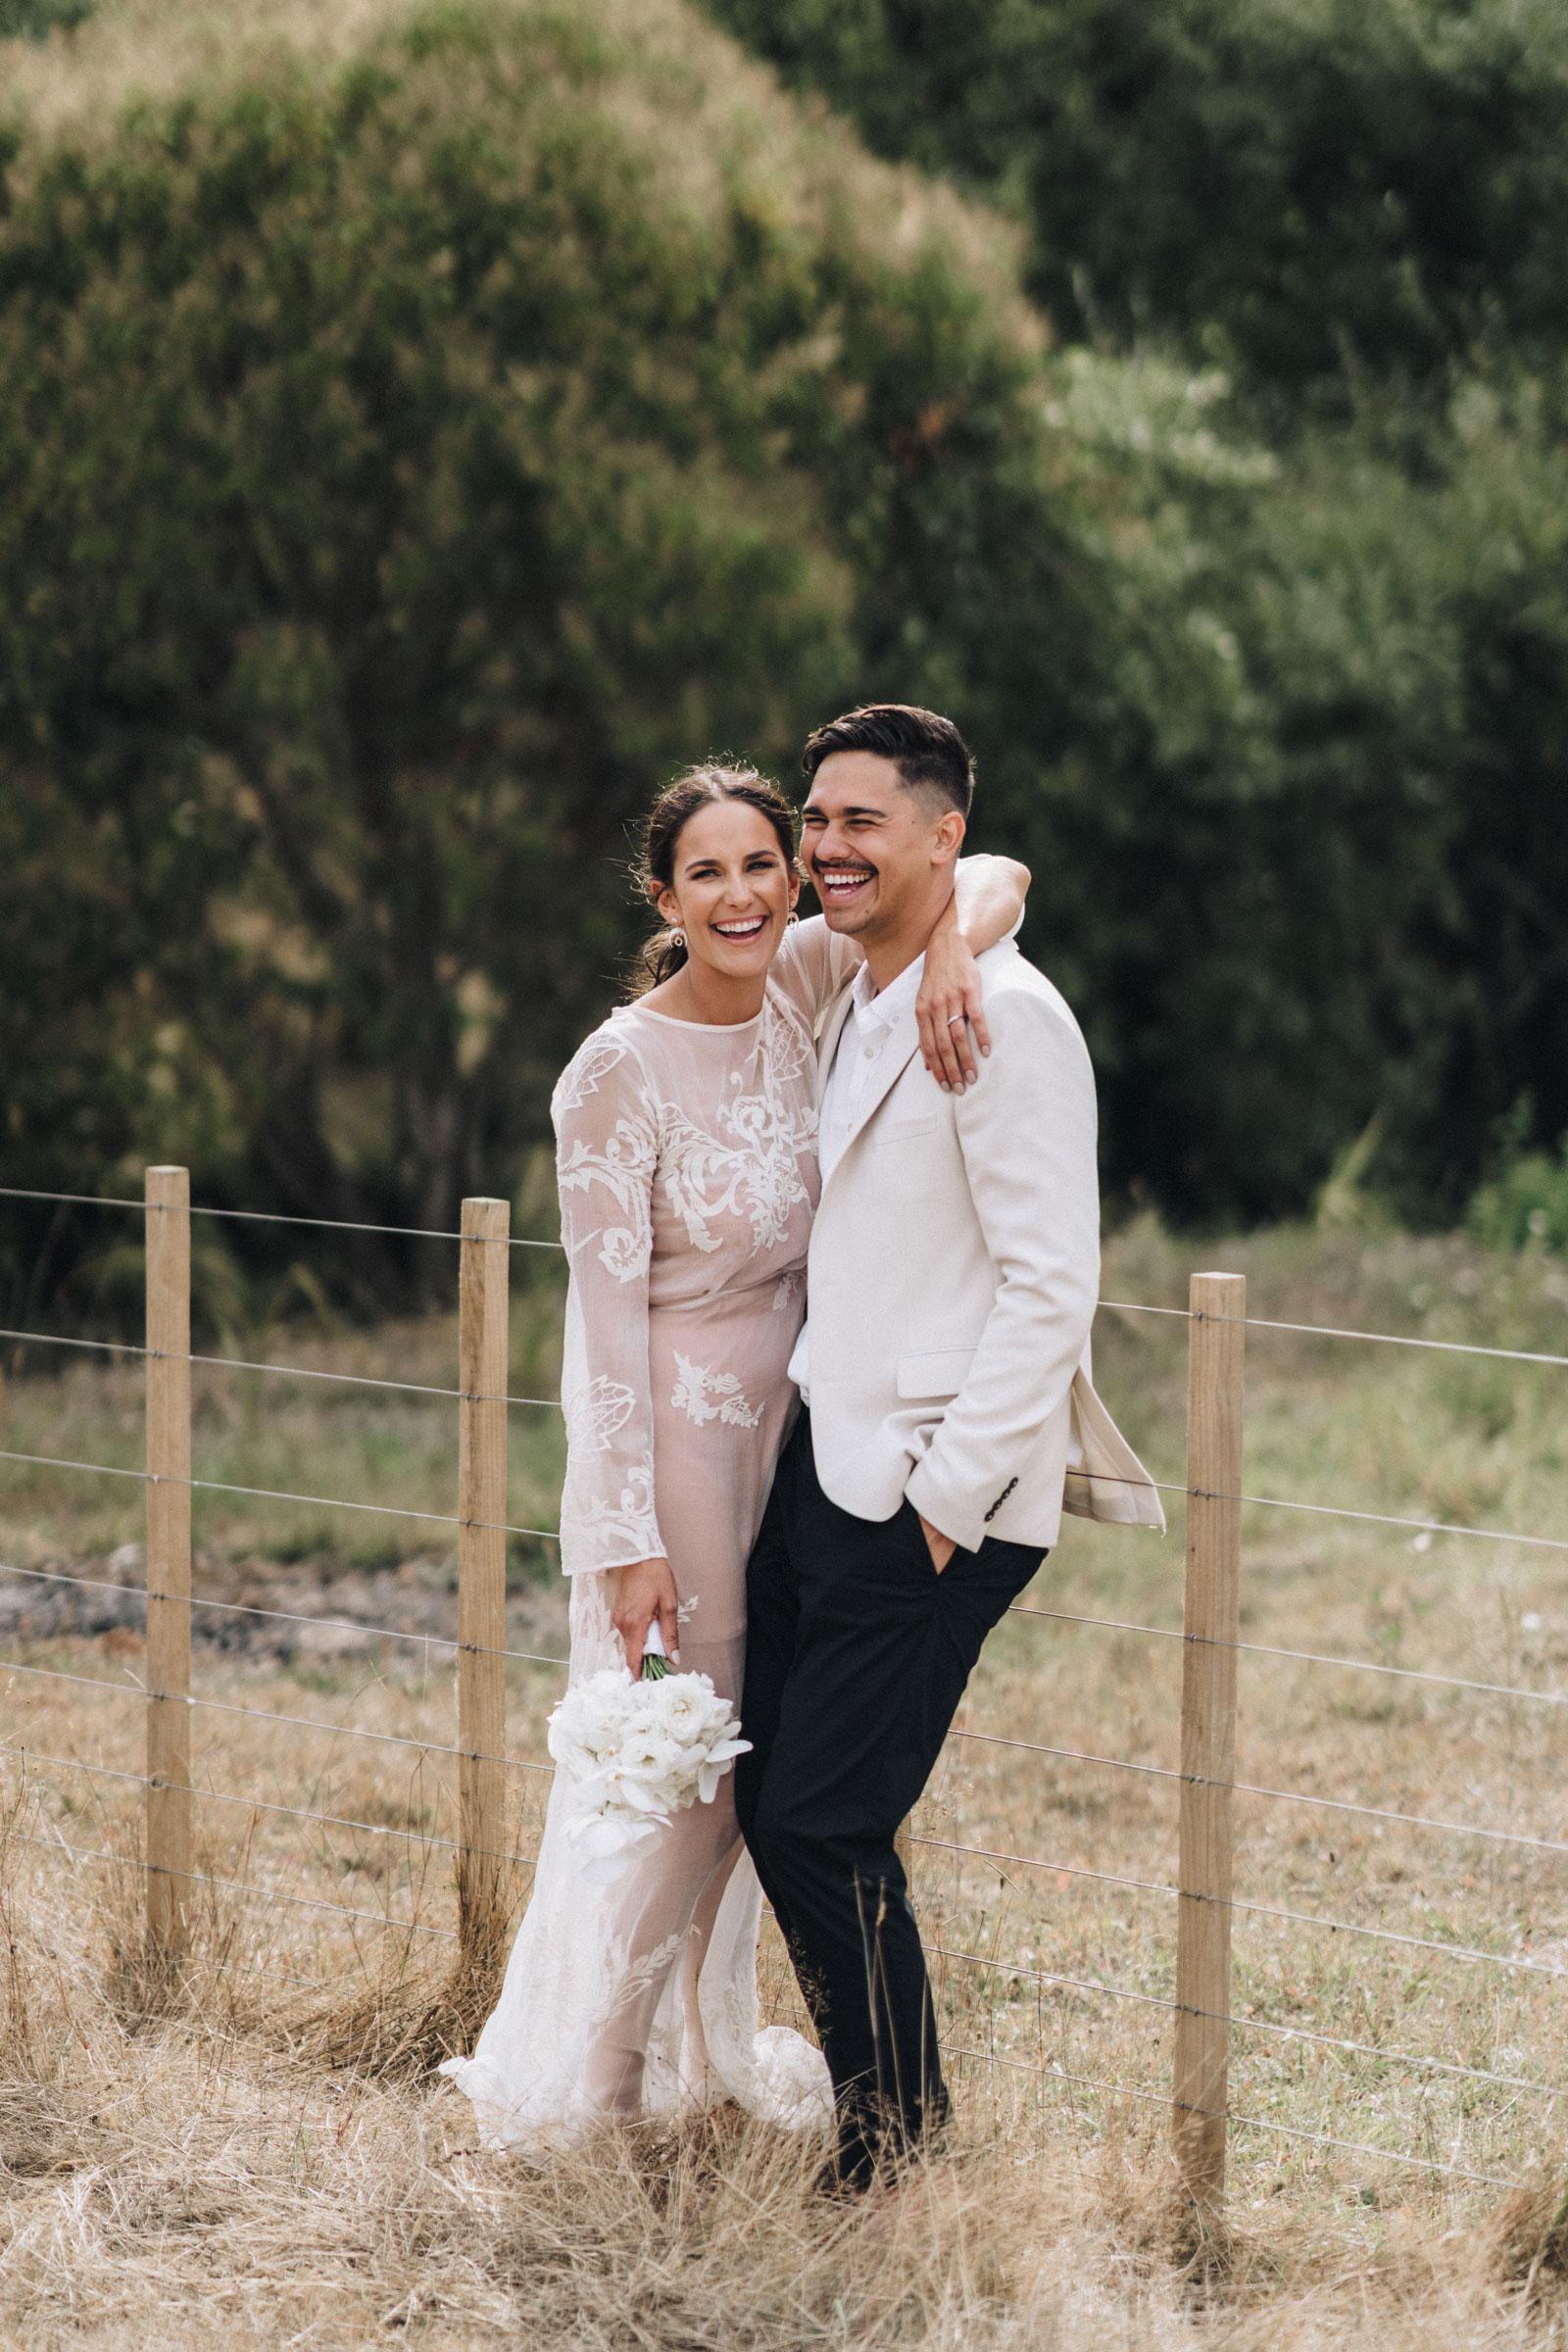 newfound-s-t-hunua-auckland-wedding-photographers-064